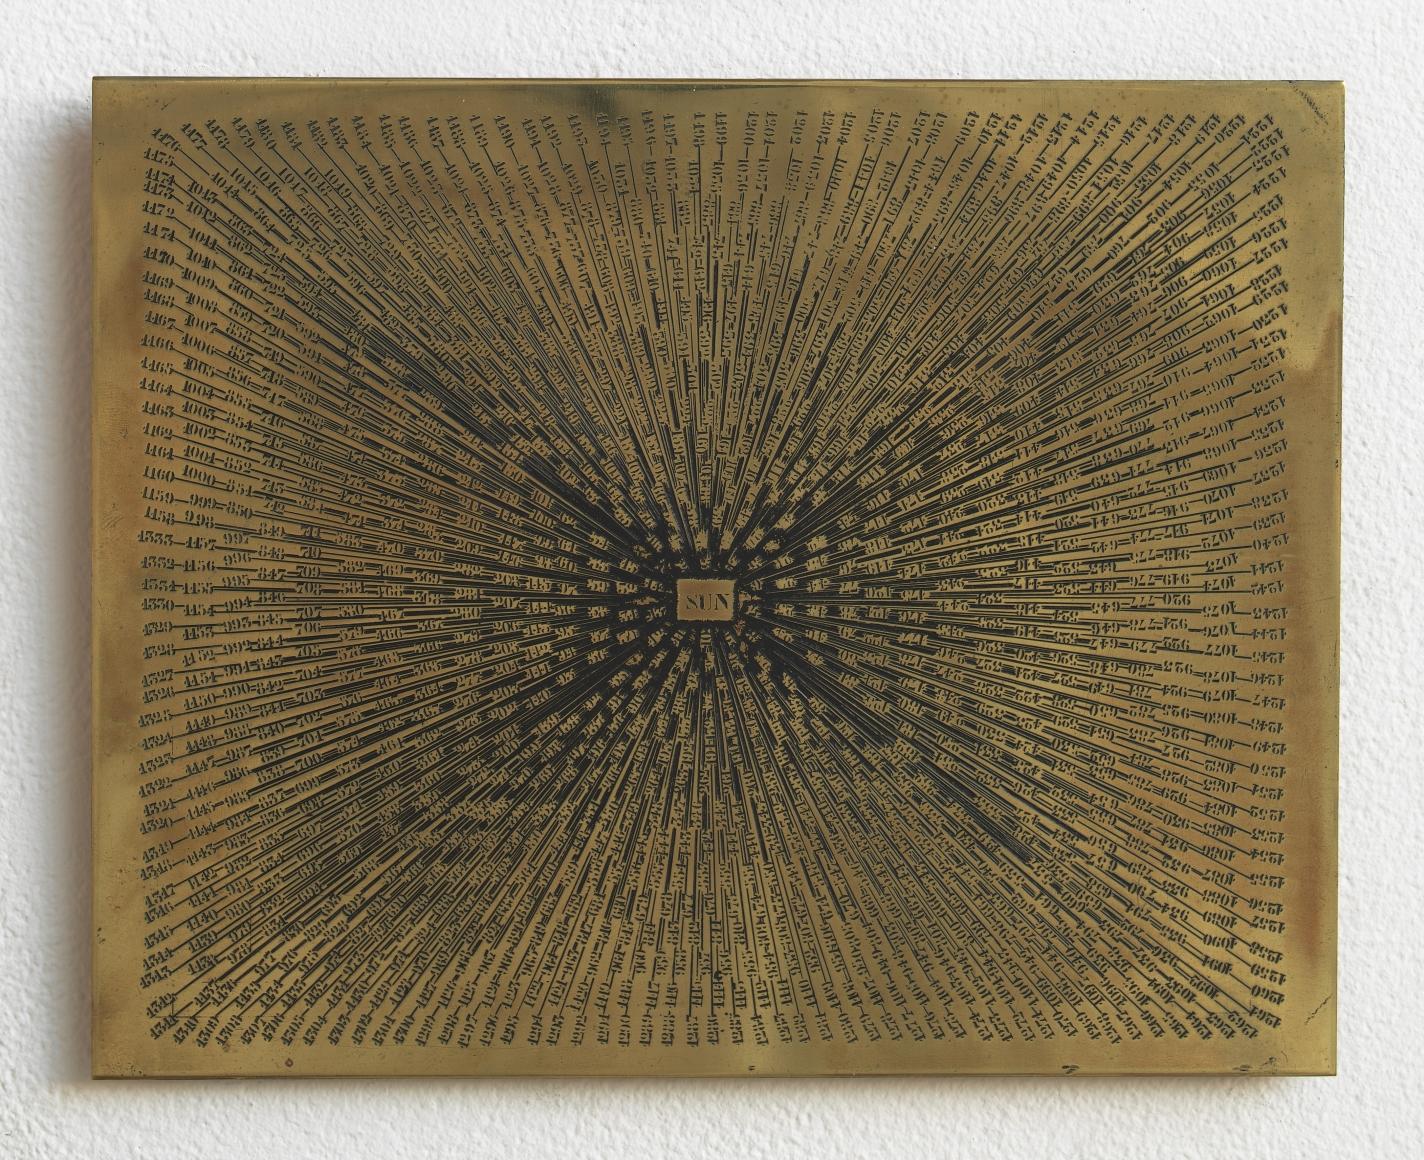 Luis Camnitzer Artists Alexander Gray Associates